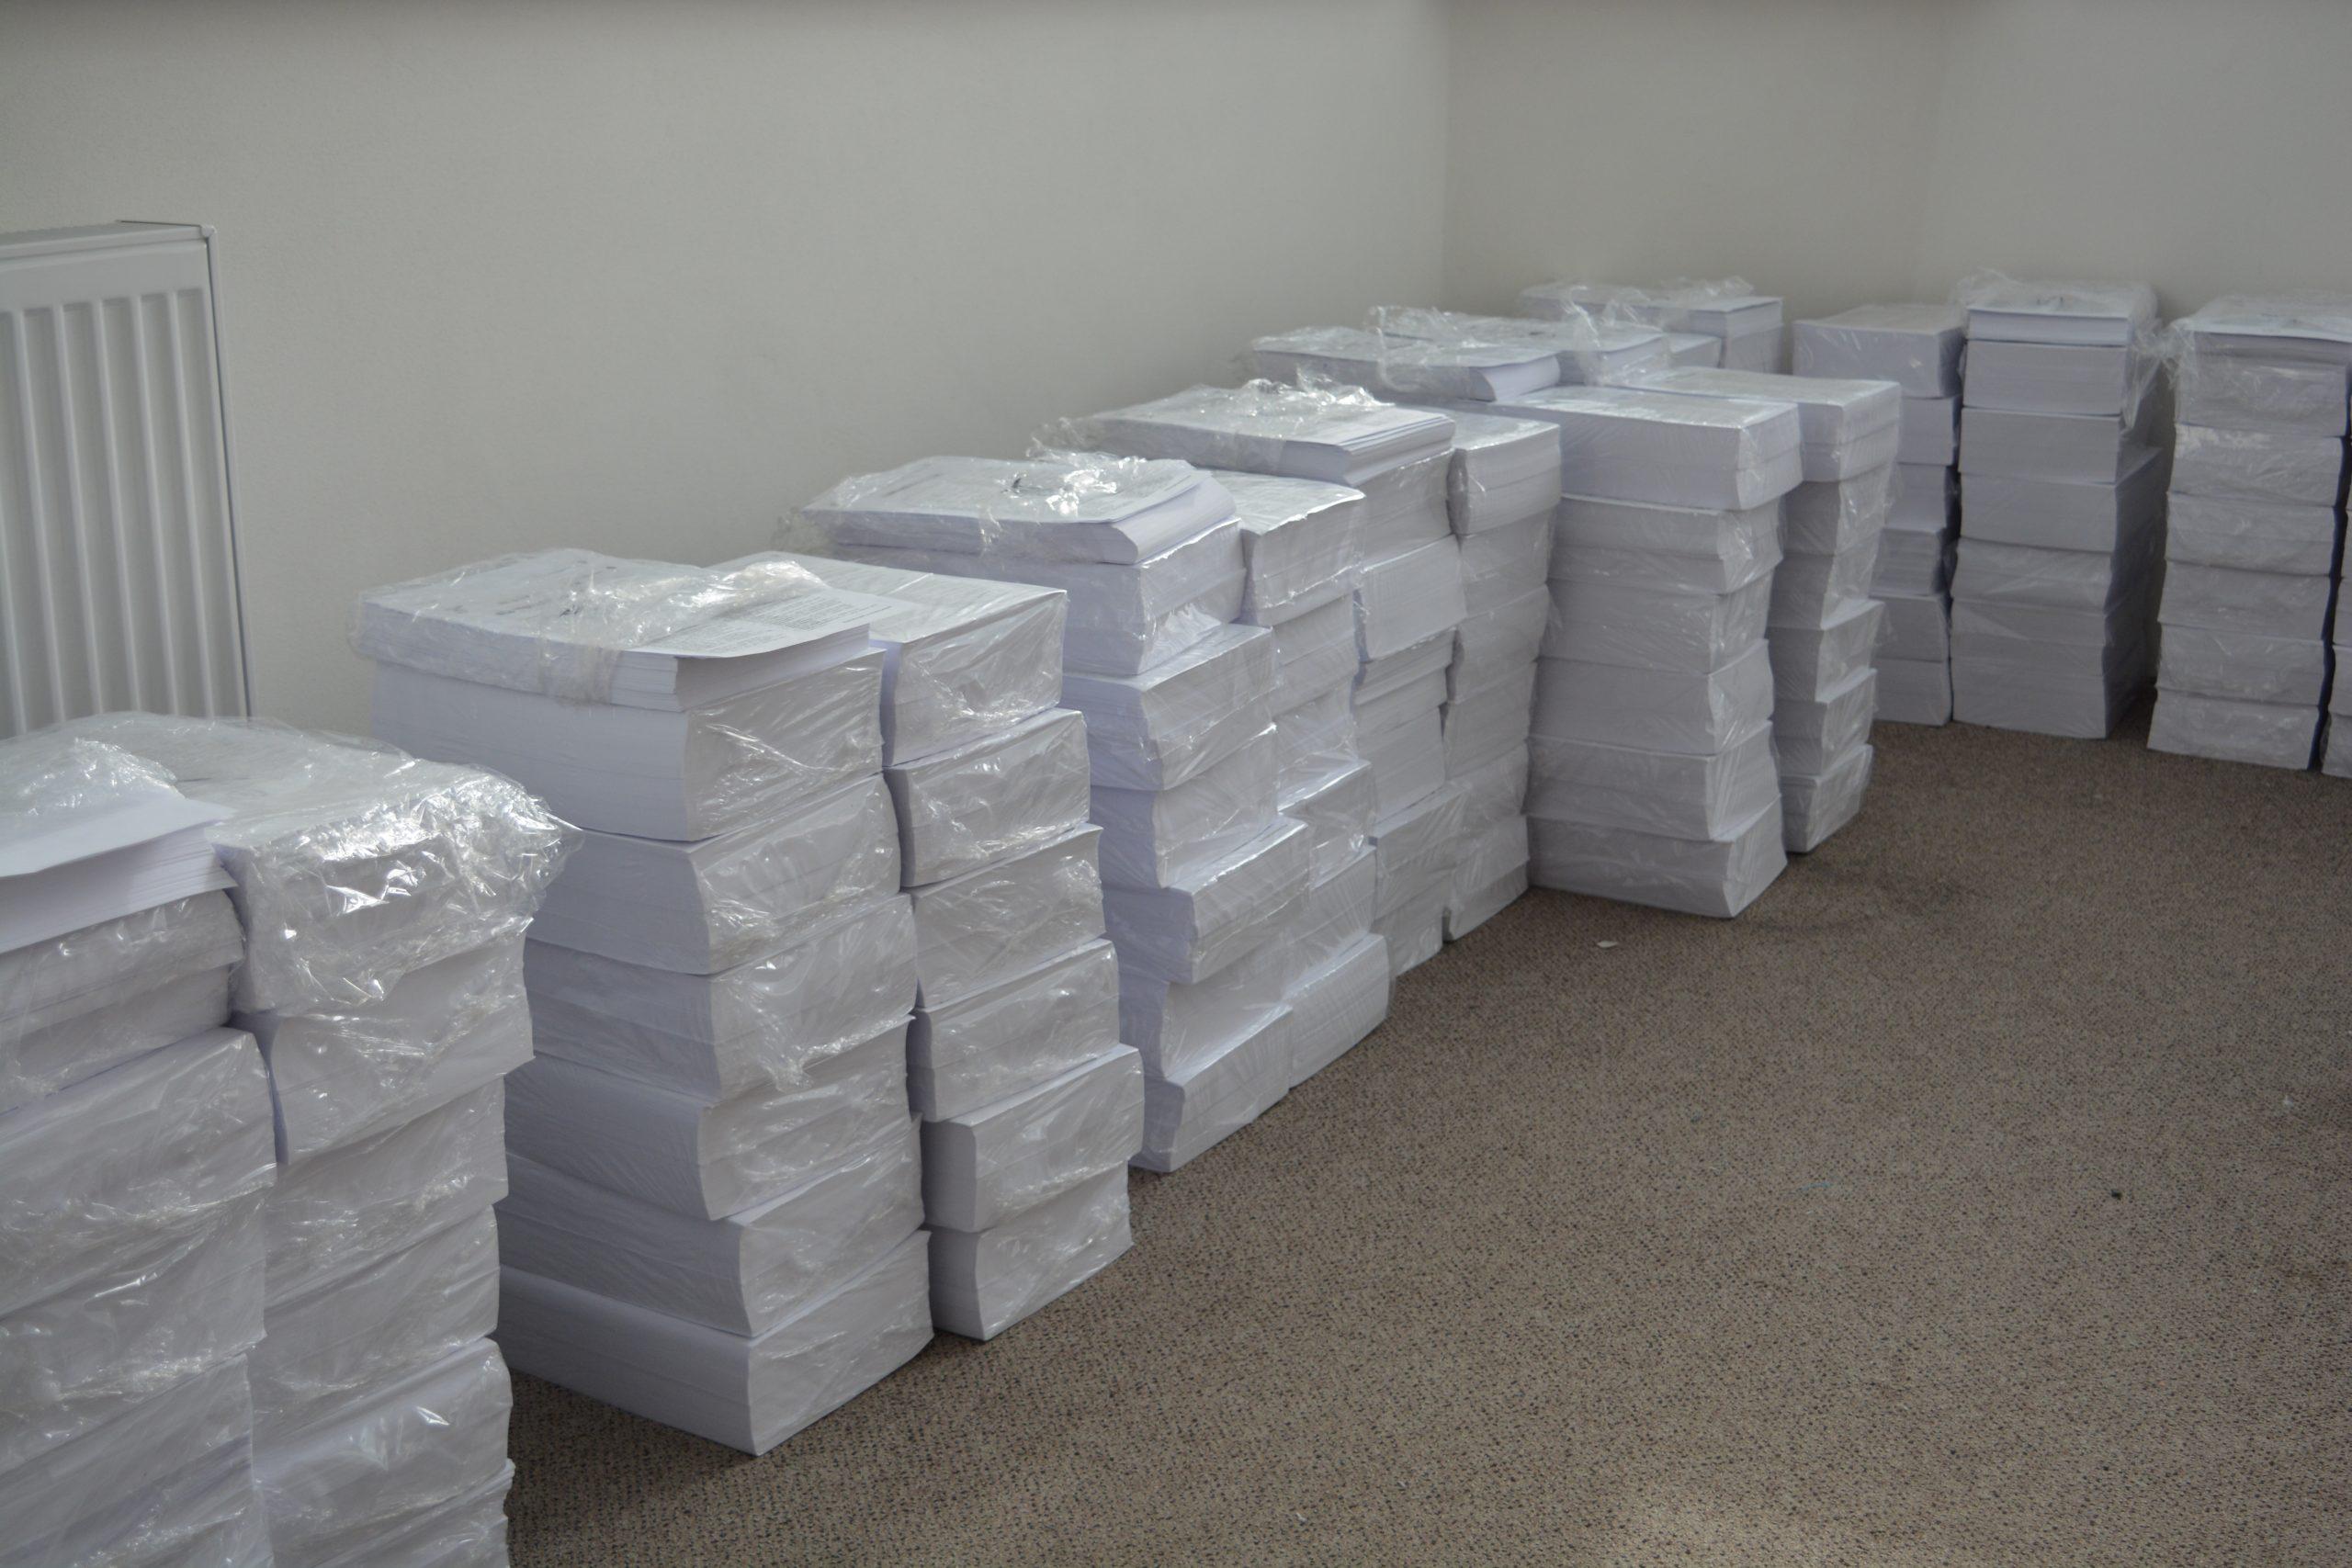 Jeden a pol tony vážia hlasovacie lístky v Detve